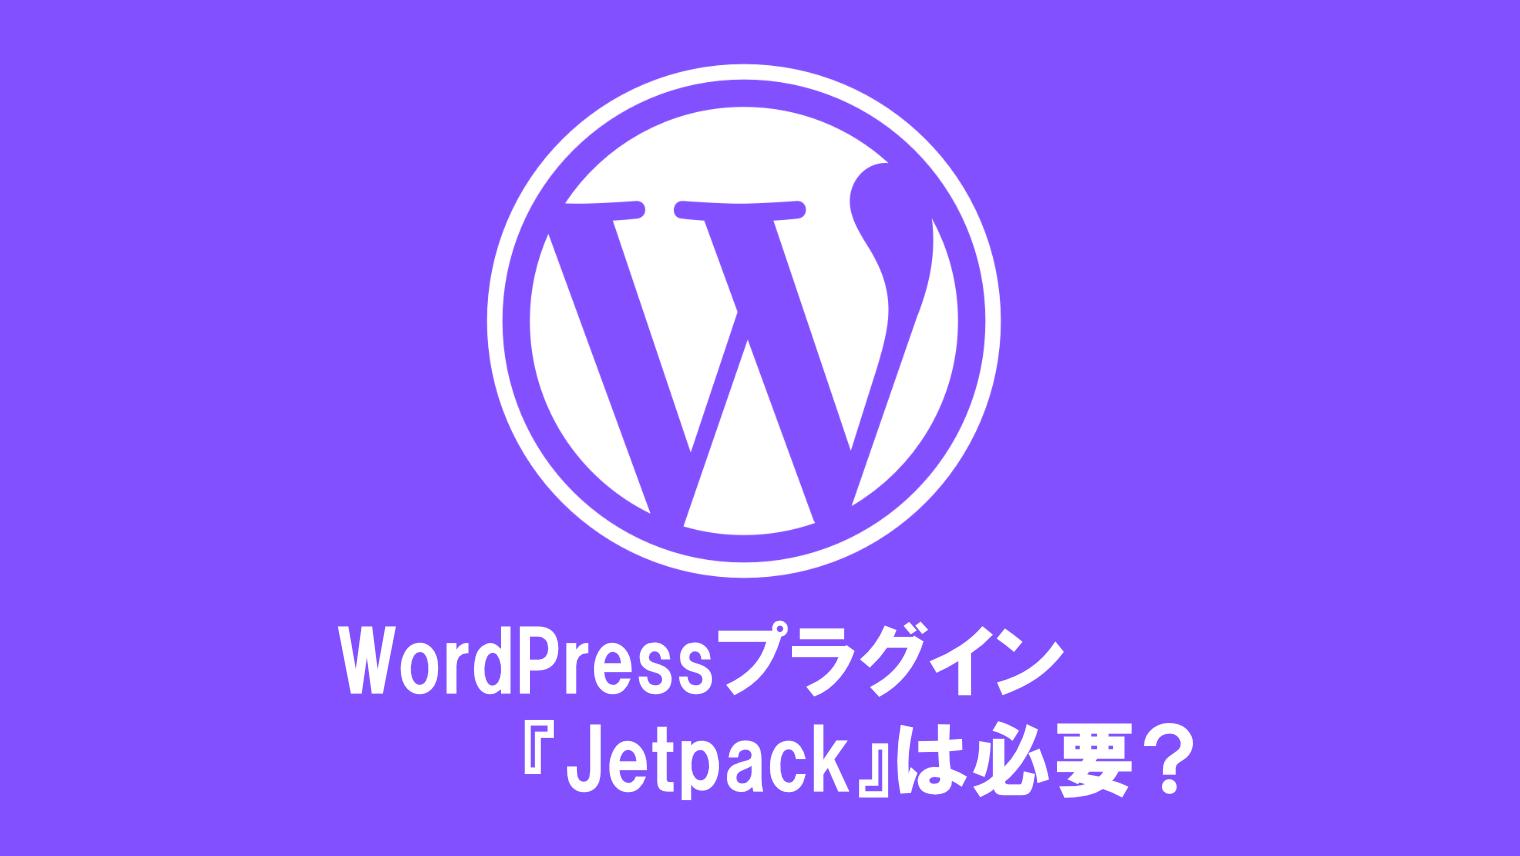 【WordPress】Jetpackは必要?不要?1つのポイントで判断しよう!